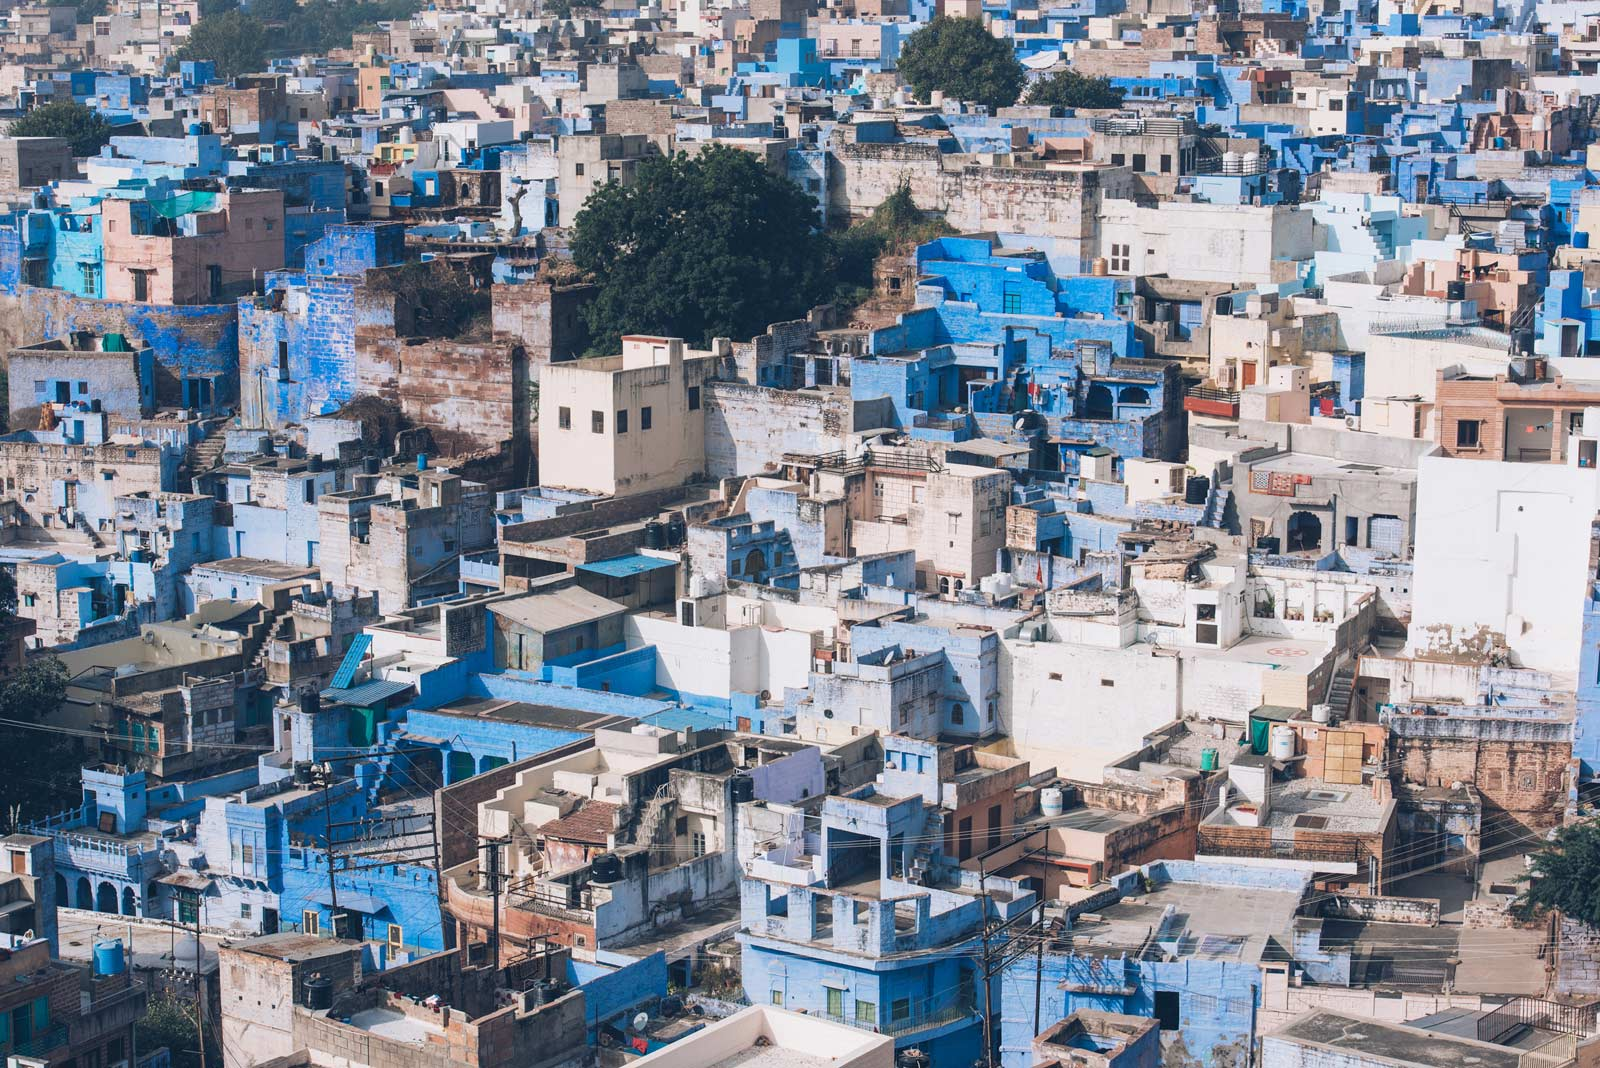 visiter jodhpur blog voyage